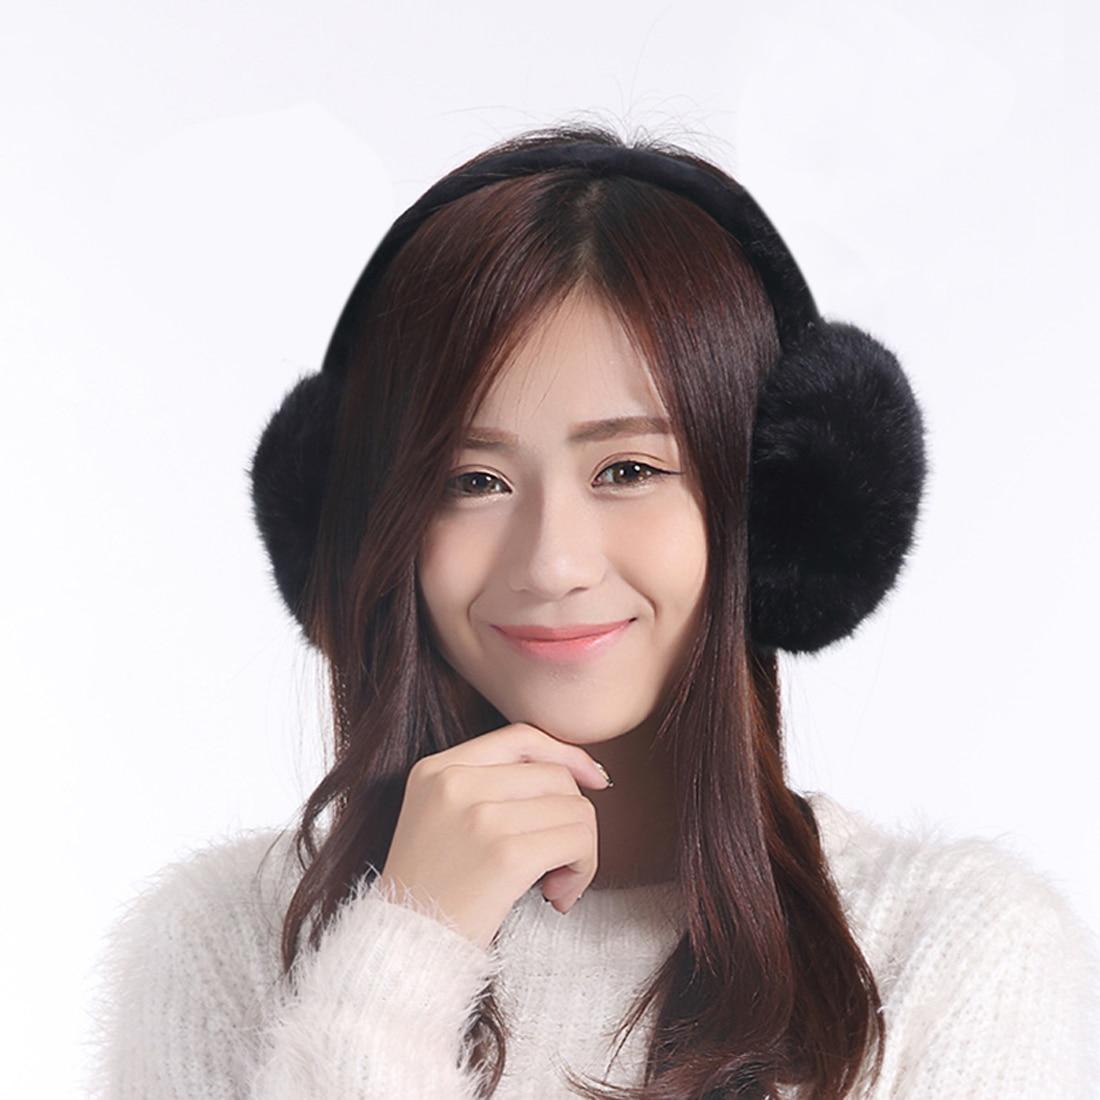 Winter Warm Big Earmuff New fur Solid Color Earmuffs Adult Children Classic Ear Cover Winter Comfortable Unisex Fur Earmuff